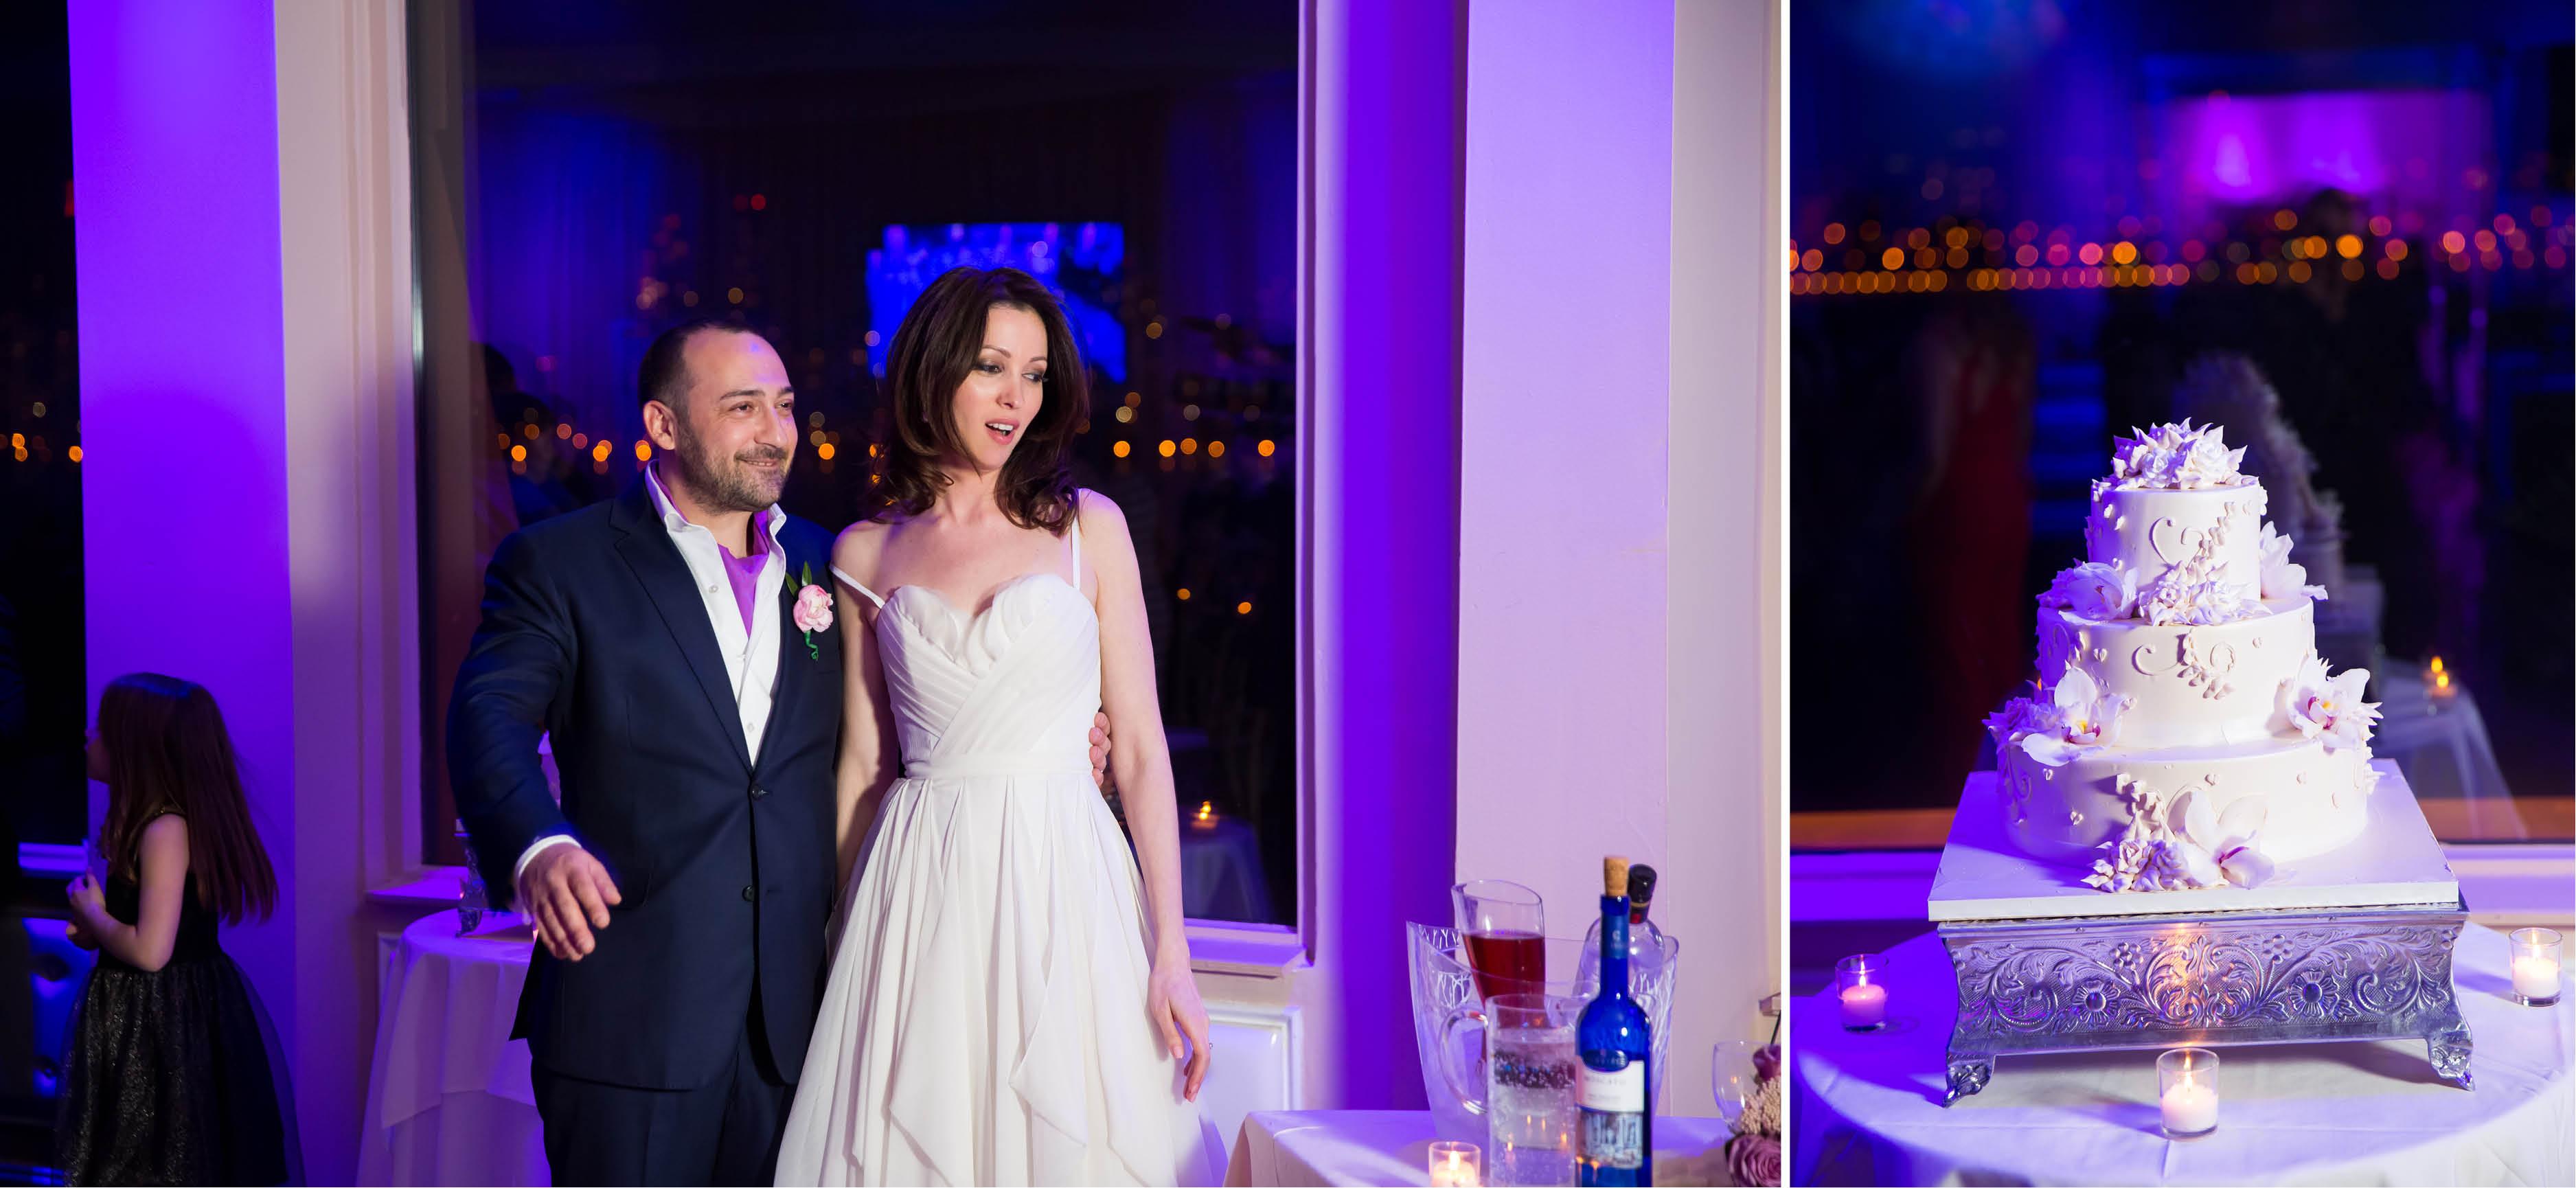 Emma_cleary_ photography_Waterside NJ wedding13